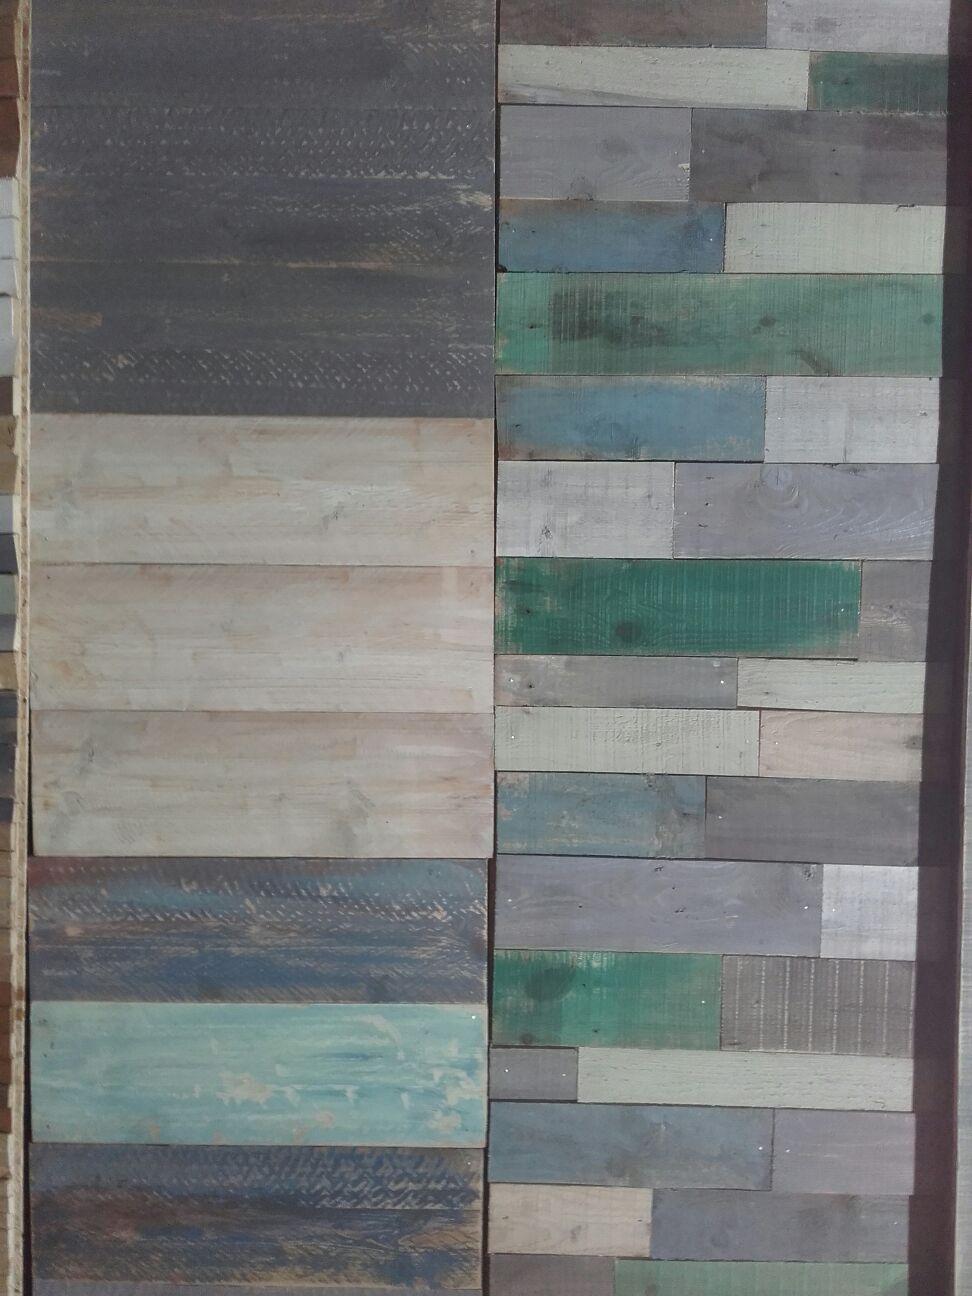 Woodindustries sloophouten wandbekleding op kleur product in beeld startpagina voor - Ontwerp wandbekleding ...